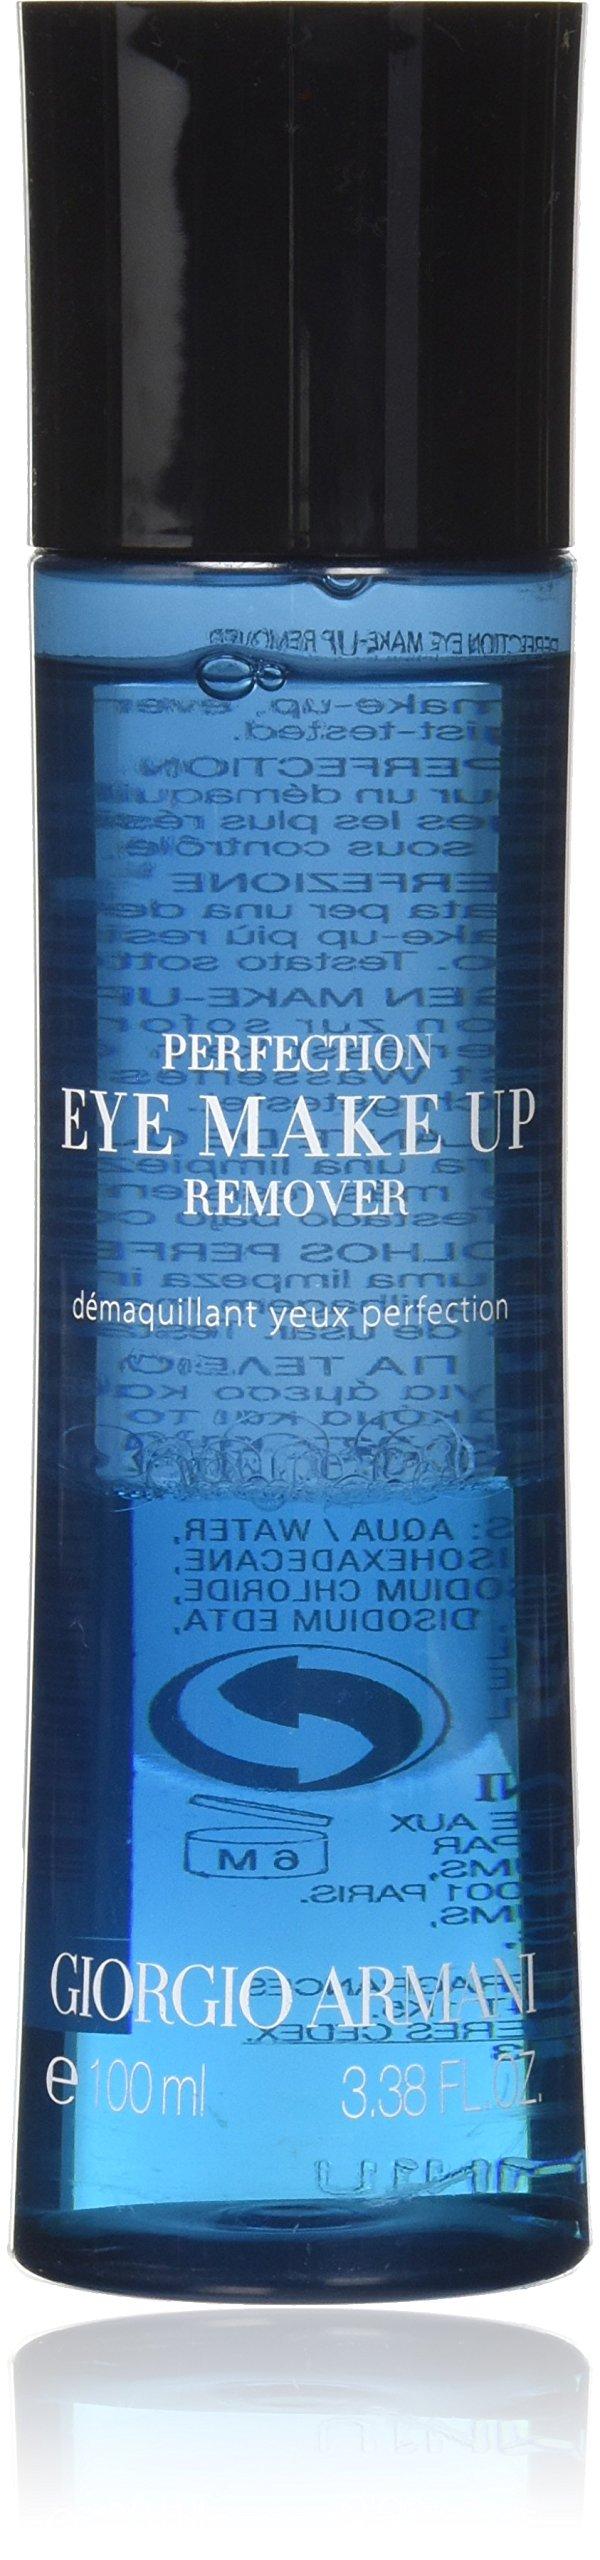 Giorgio Armani Perfection Eye Make-Up Remover, 3.38 Ounce